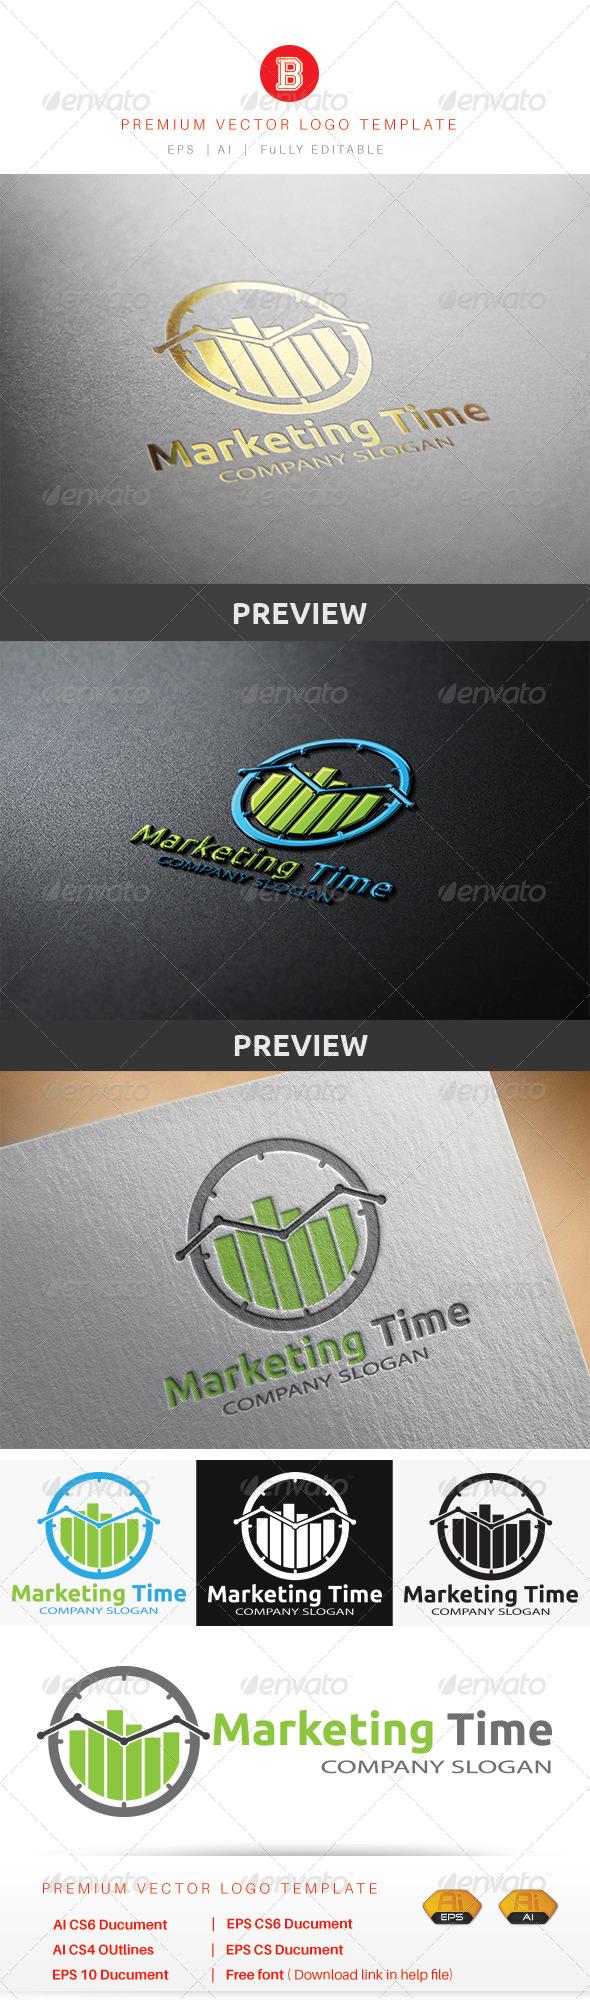 GraphicRiver Marketing Time 8679855